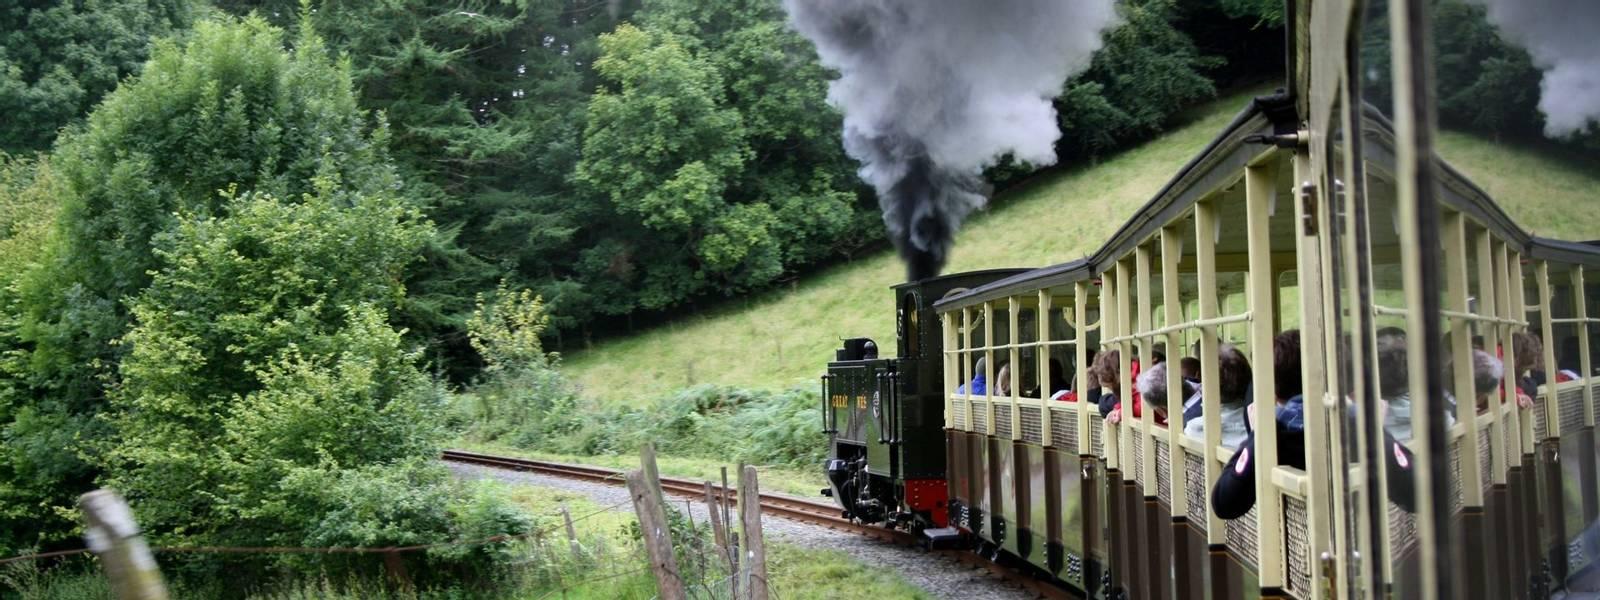 Photography - Steam Railways - AdobeStock_25759870.jpeg